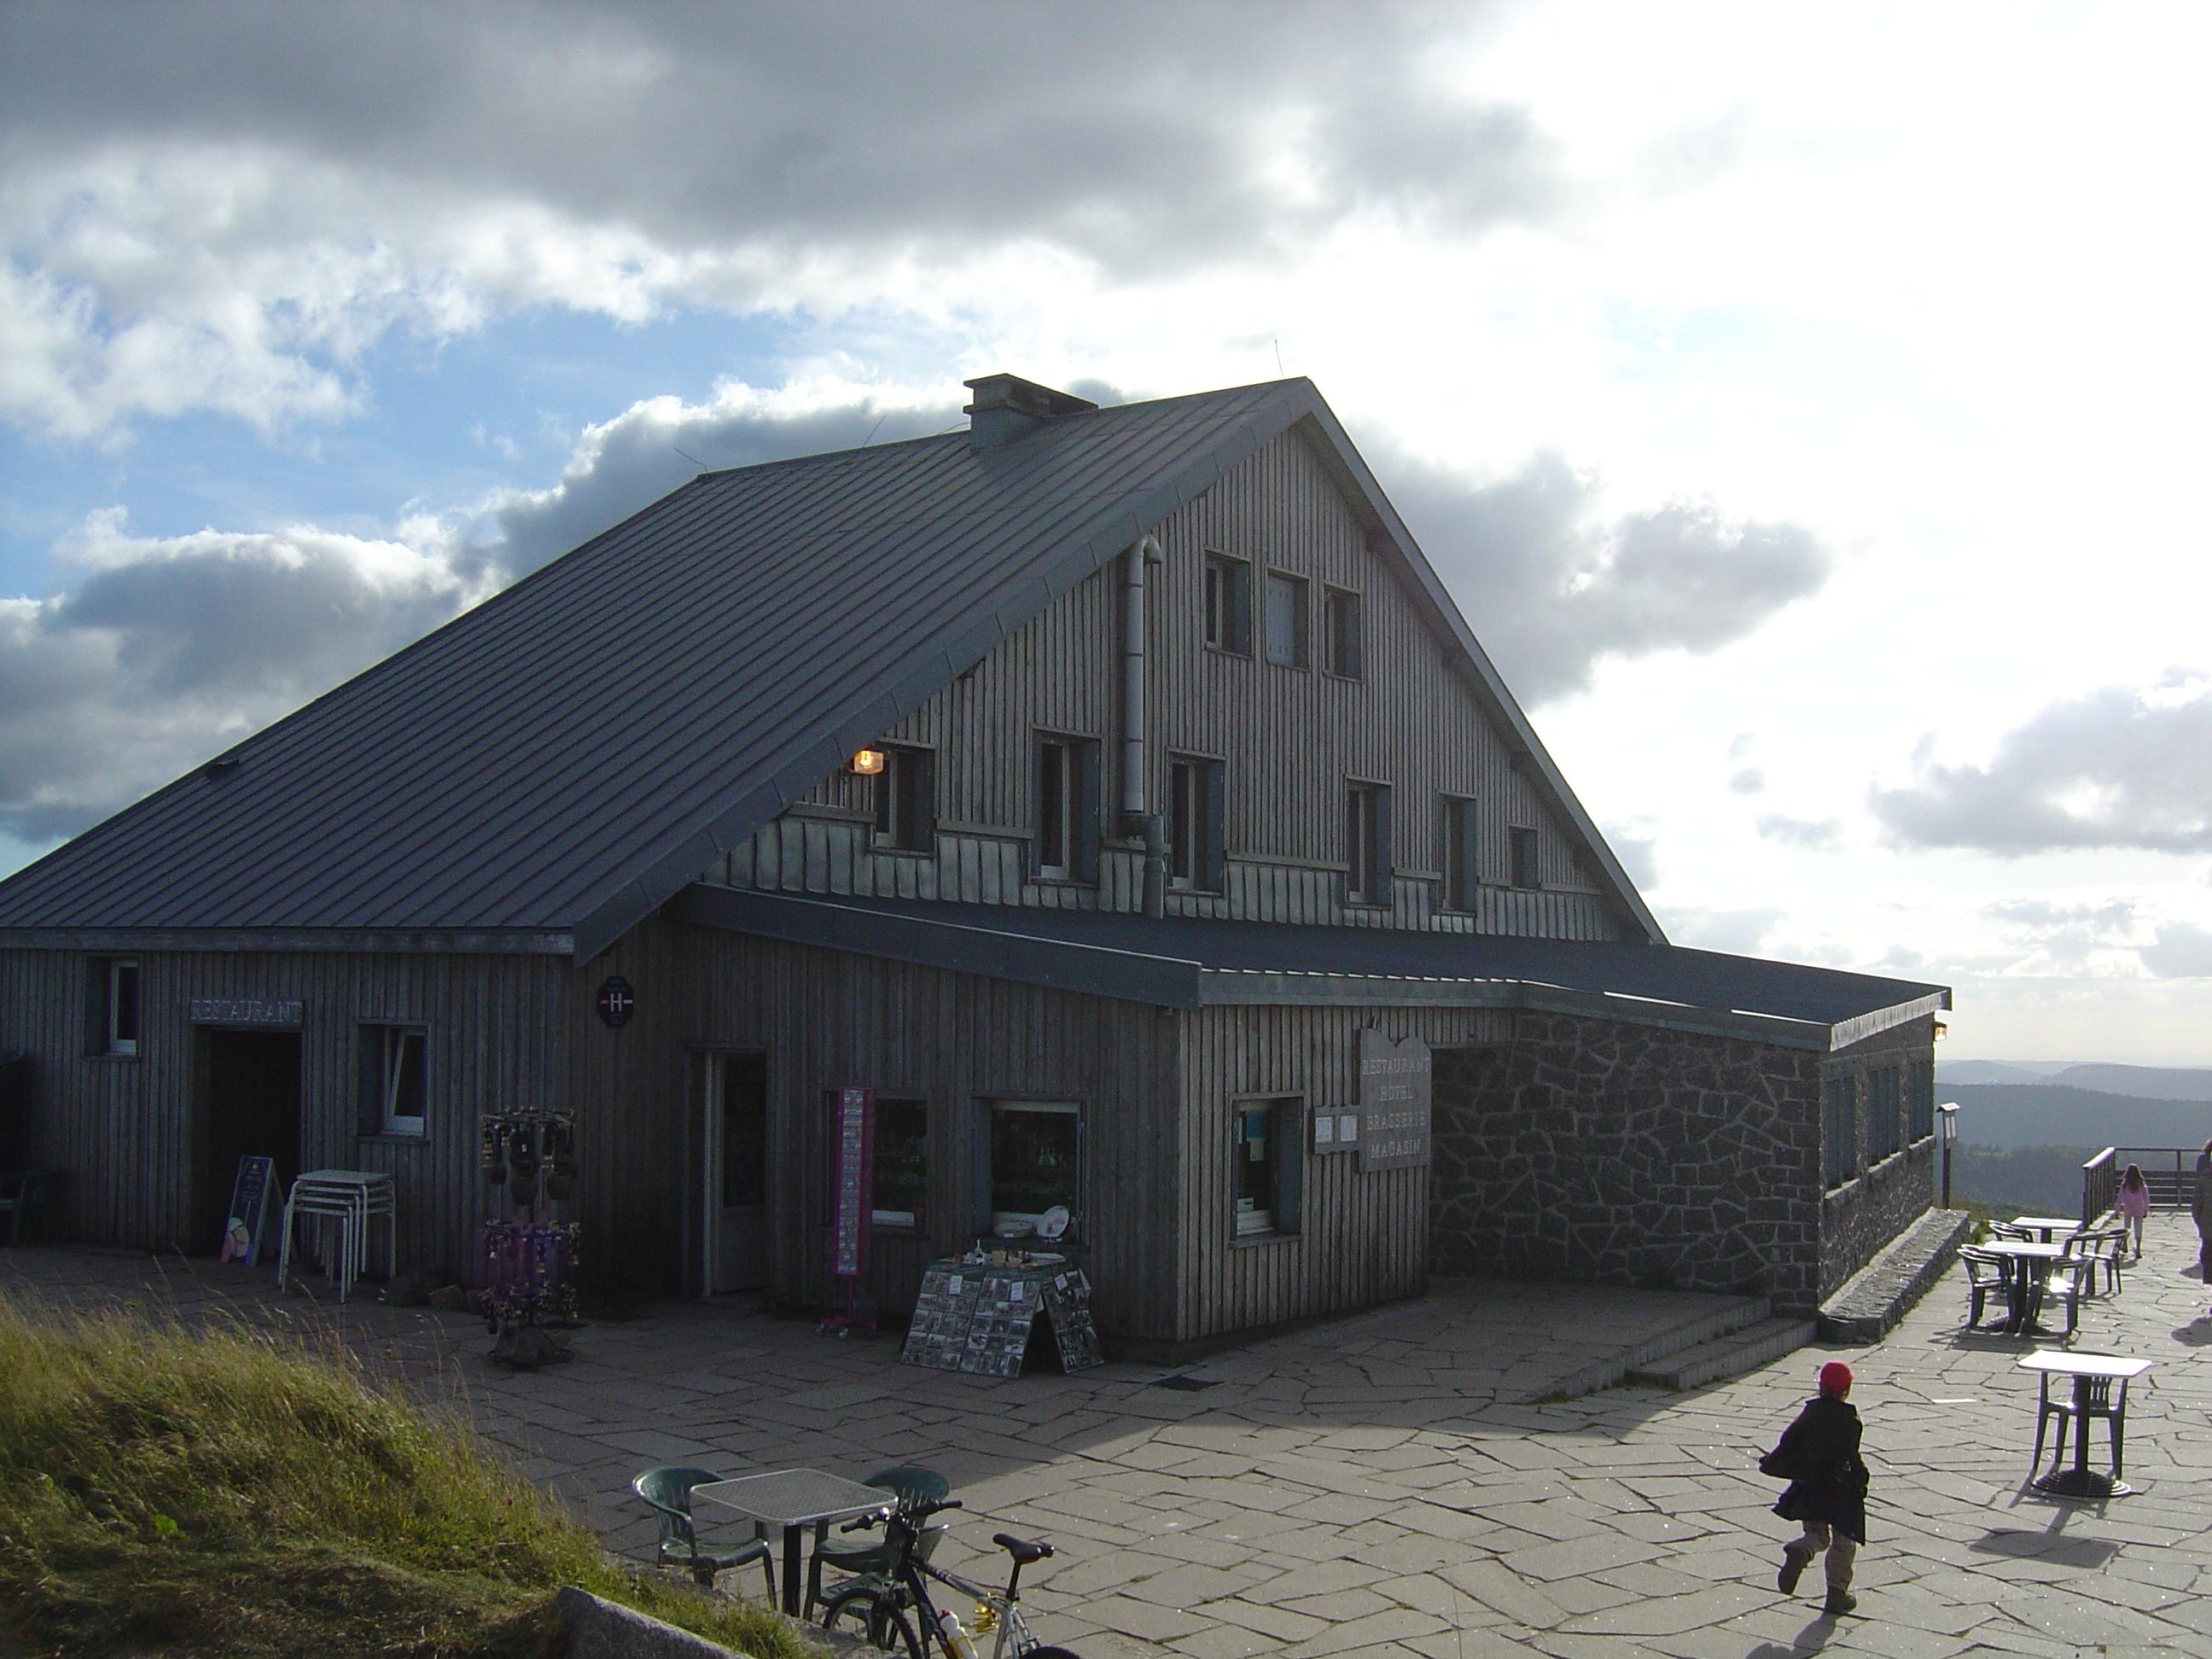 Restaurant Le Chalet Villard Saint Christophe